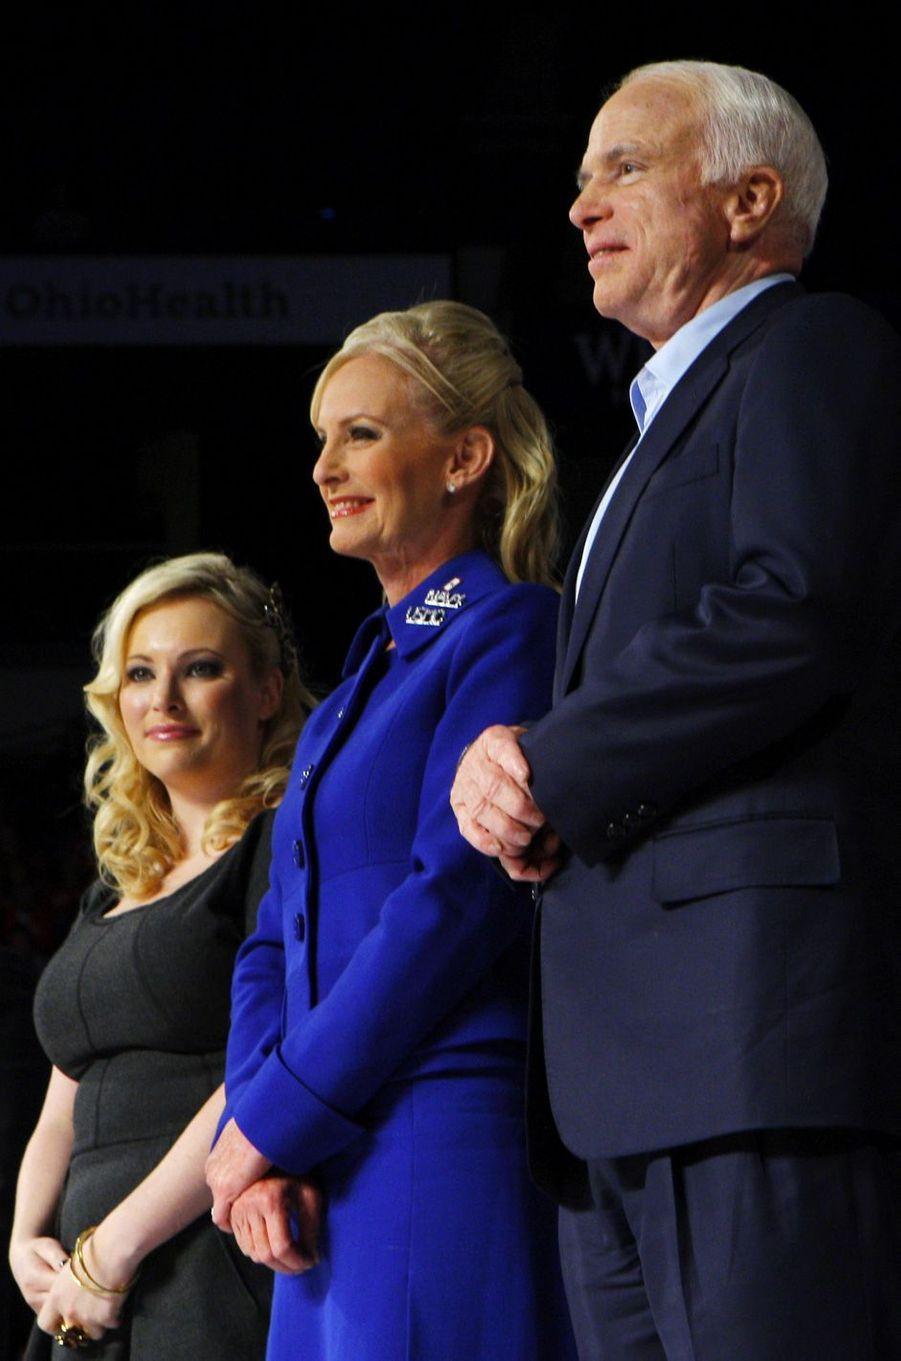 Meghan Cindy et John McCain en novembre 2008